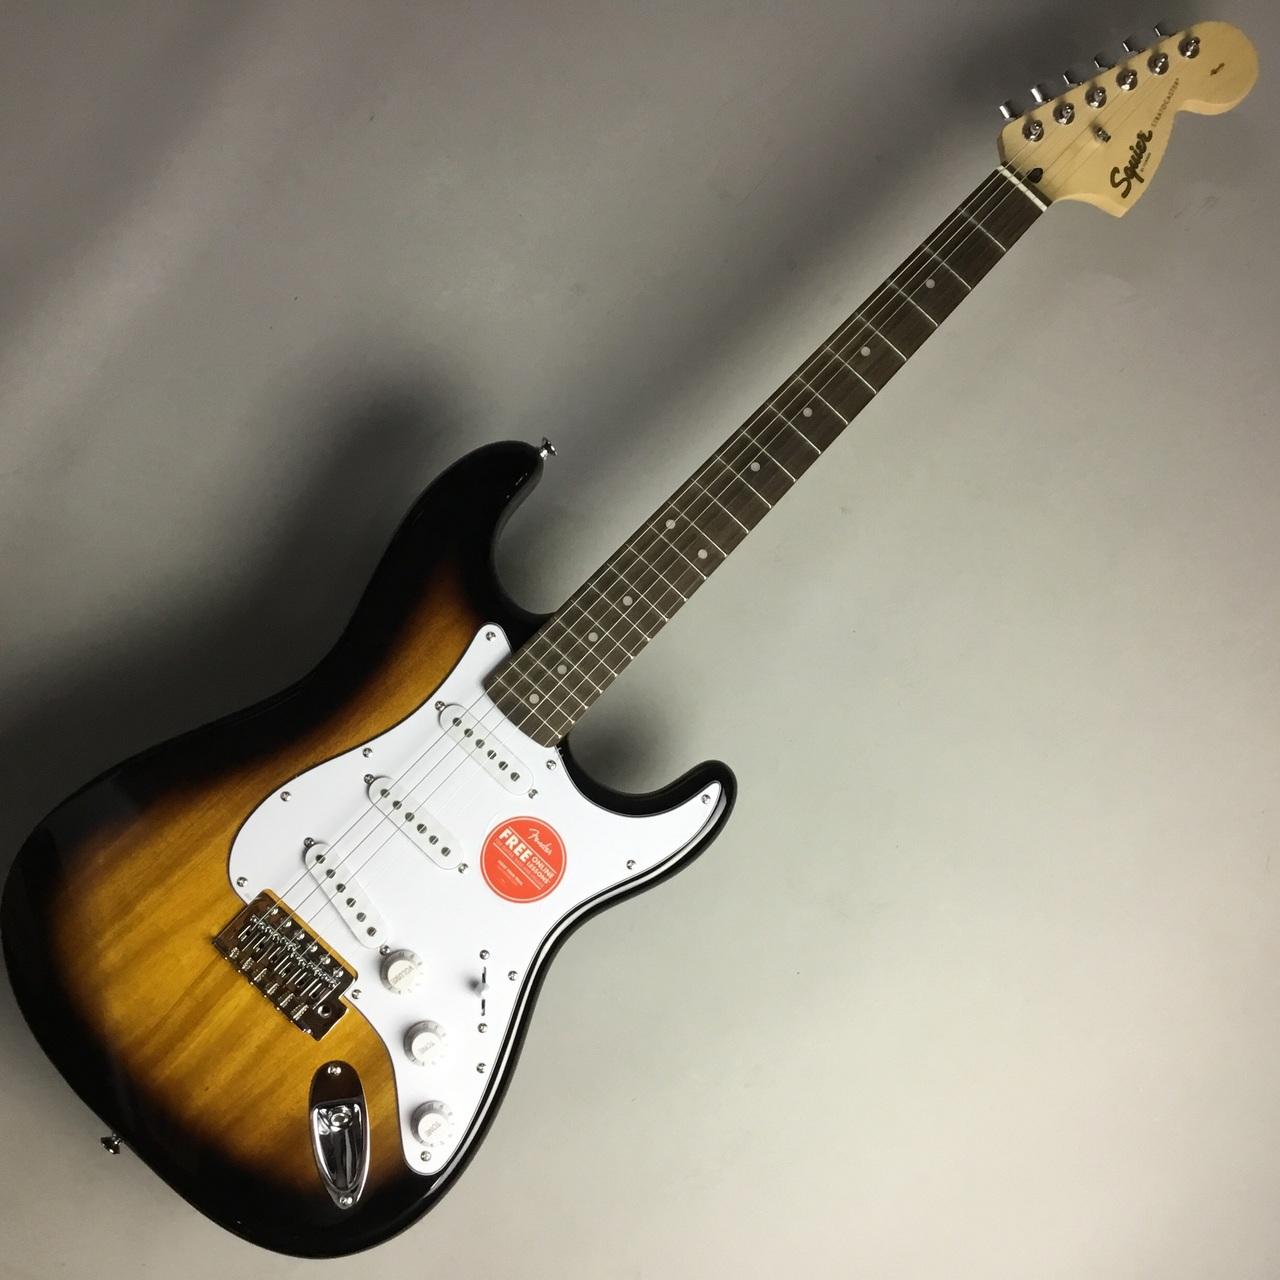 Squier by Fender AFFINITY SERIES STRATOCASTER /Brown Sunburst